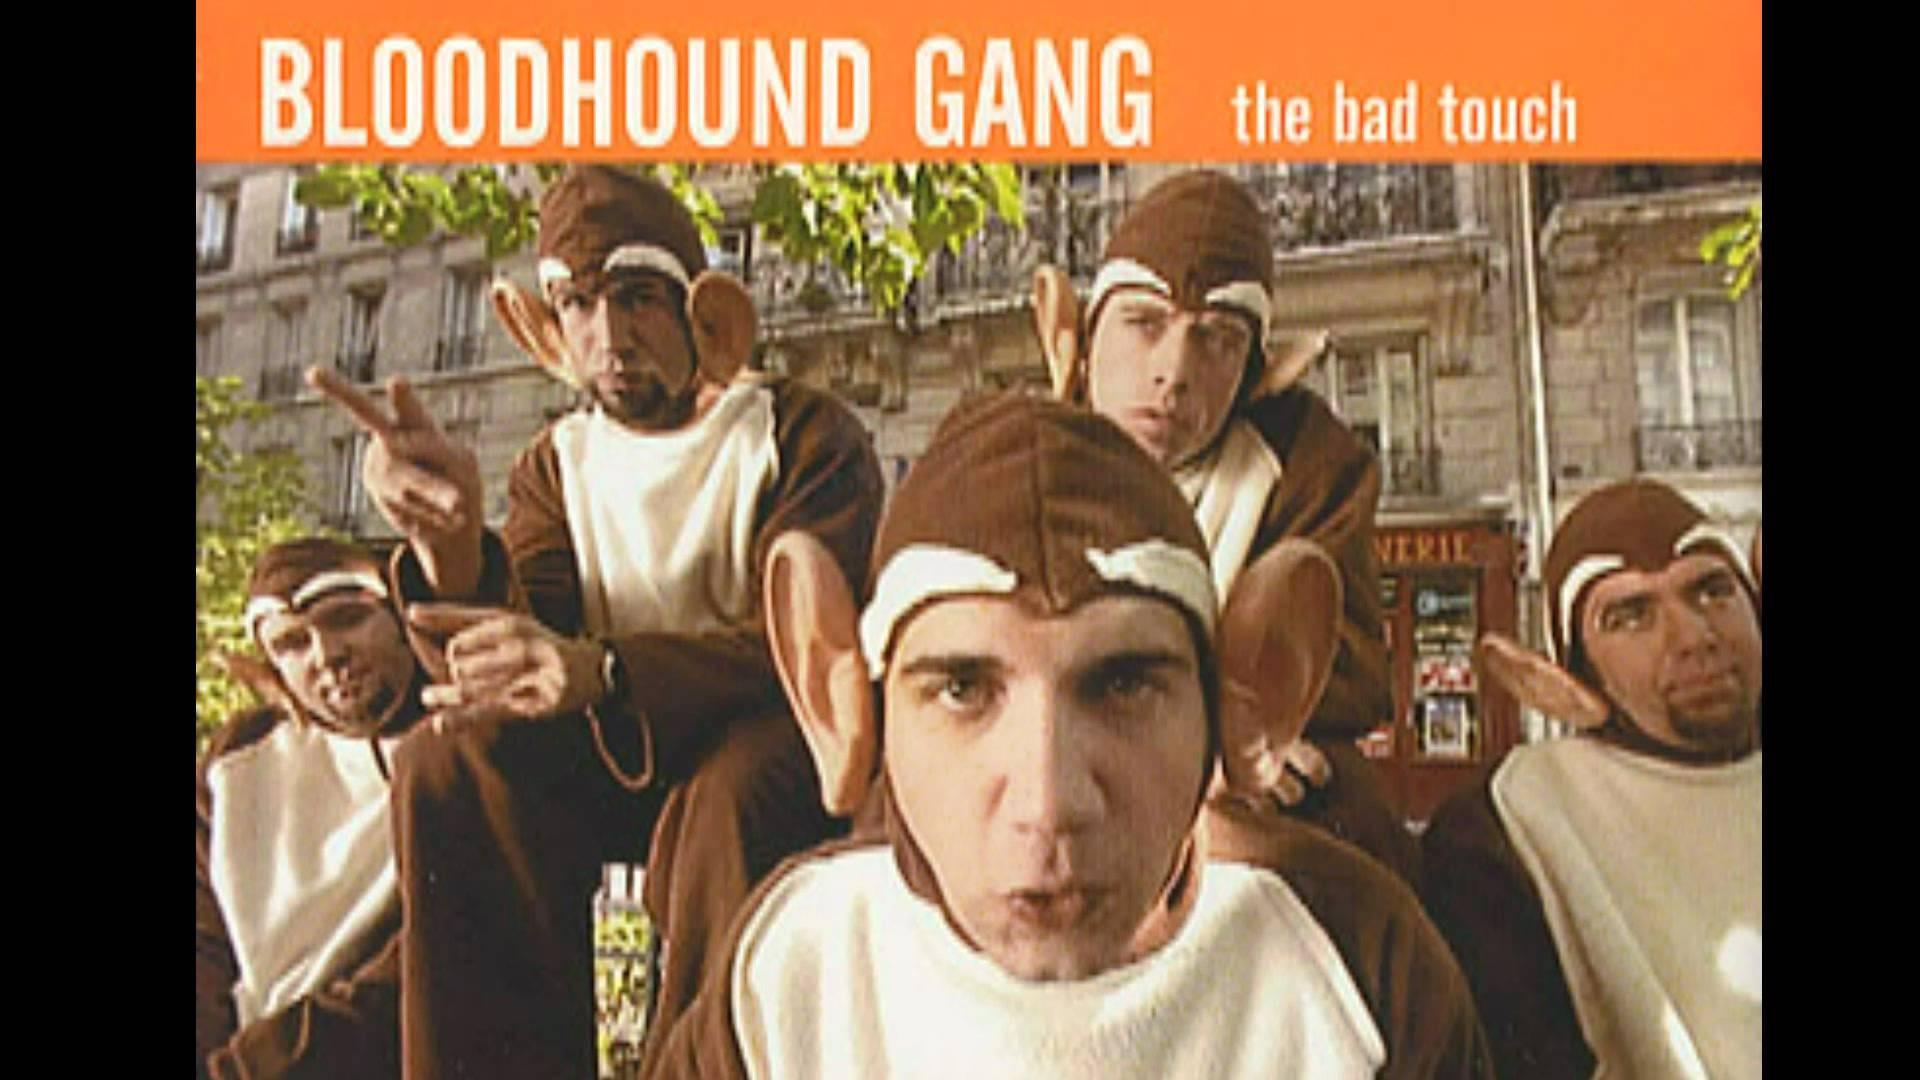 gang Bloodhound fuck